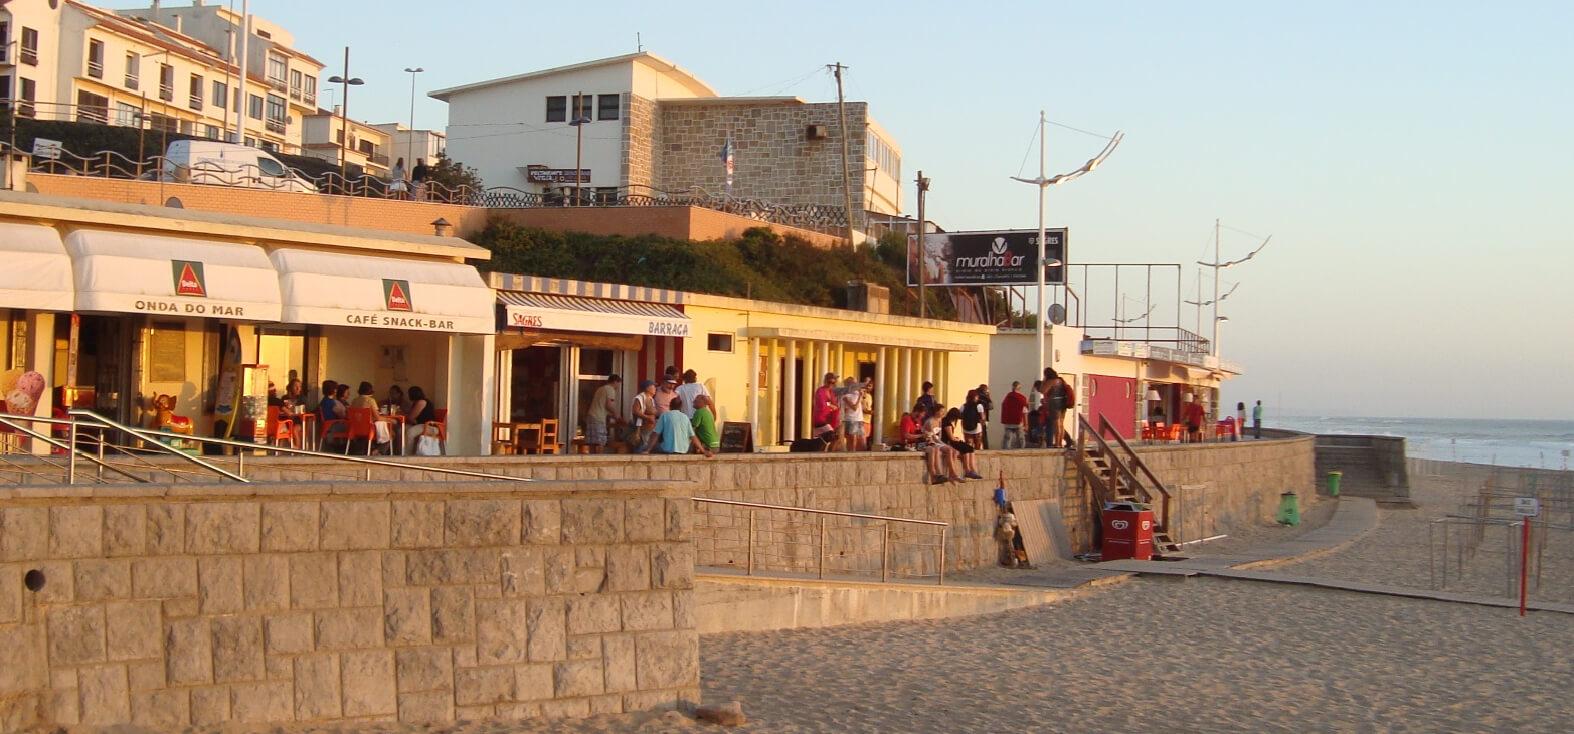 Surfcamp West Coast Surf Camp in Peniche, Leiria, Portugal